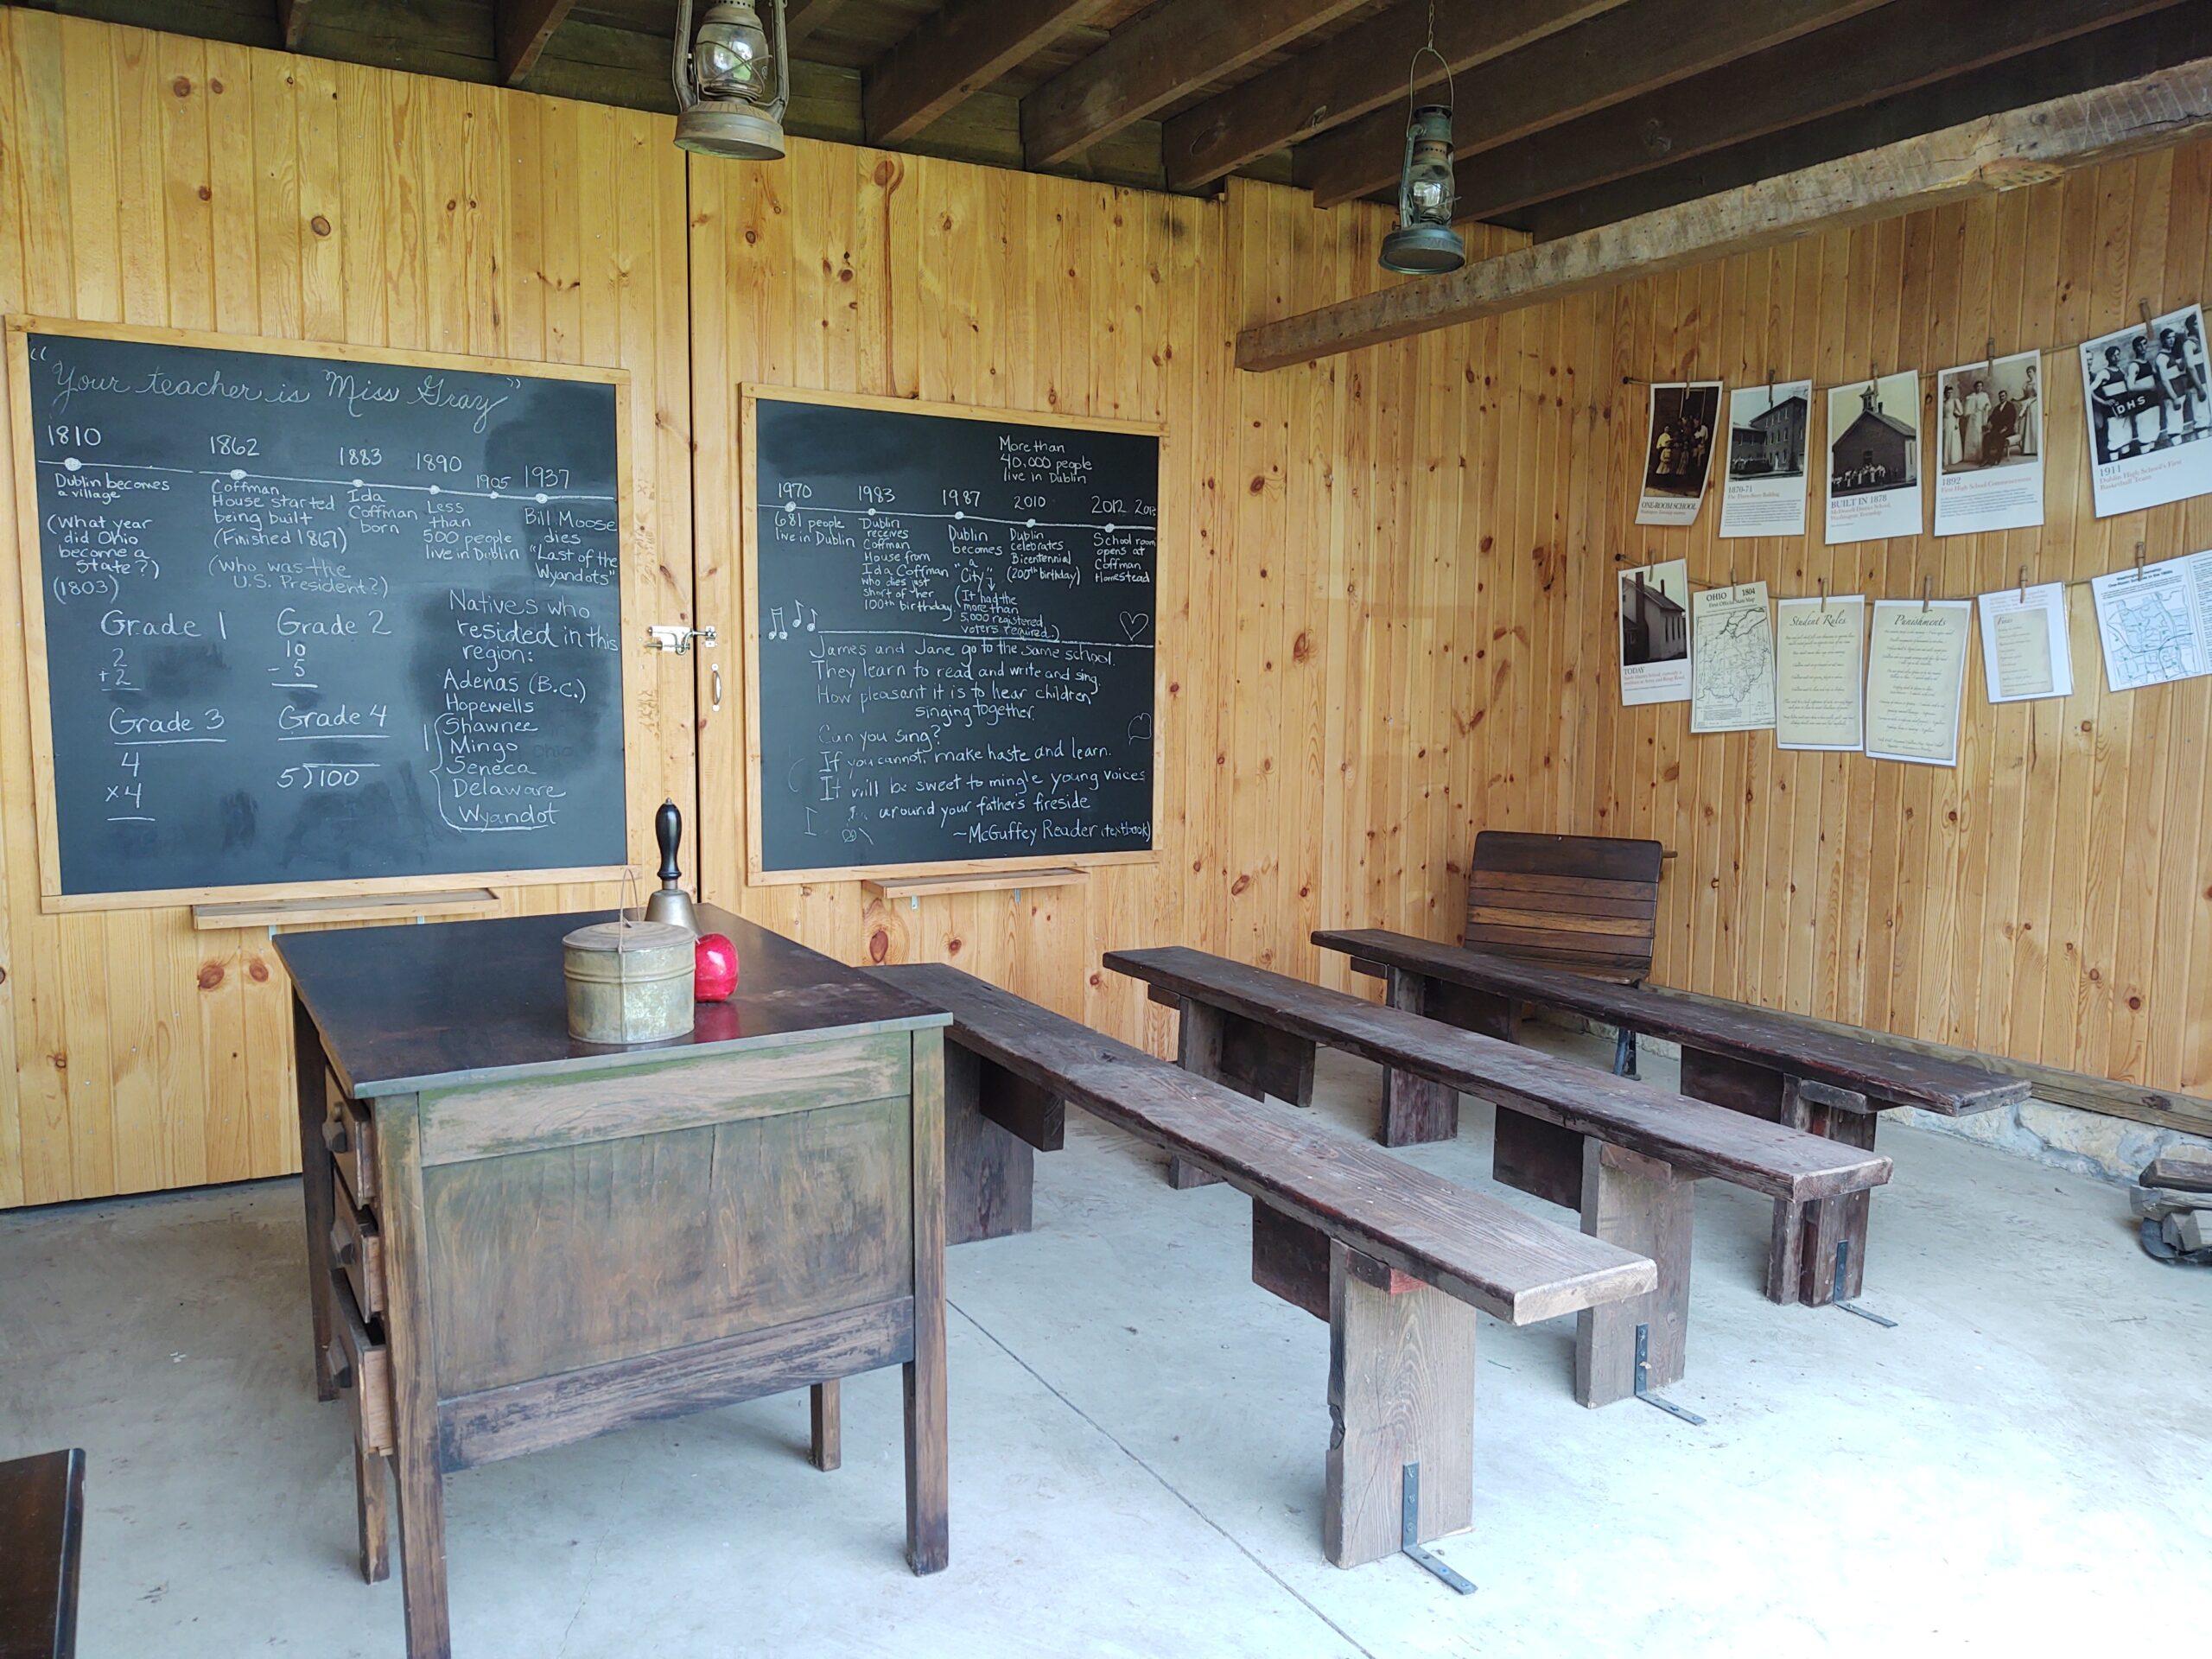 Replica School House Image 2